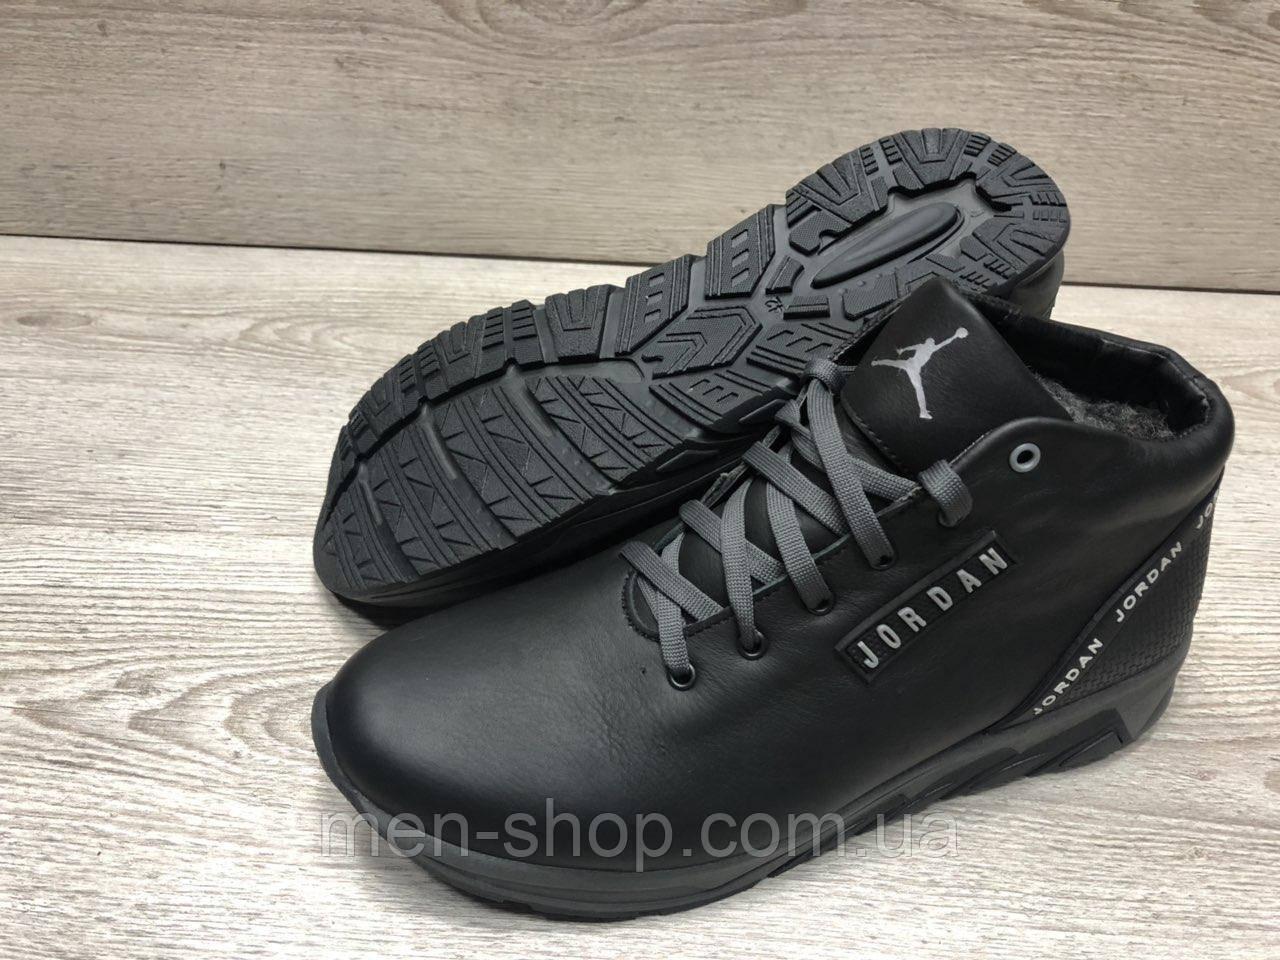 7e78dc1a Теплые Зимние мужские кроссовки в стиле Jordan: продажа, цена в ...